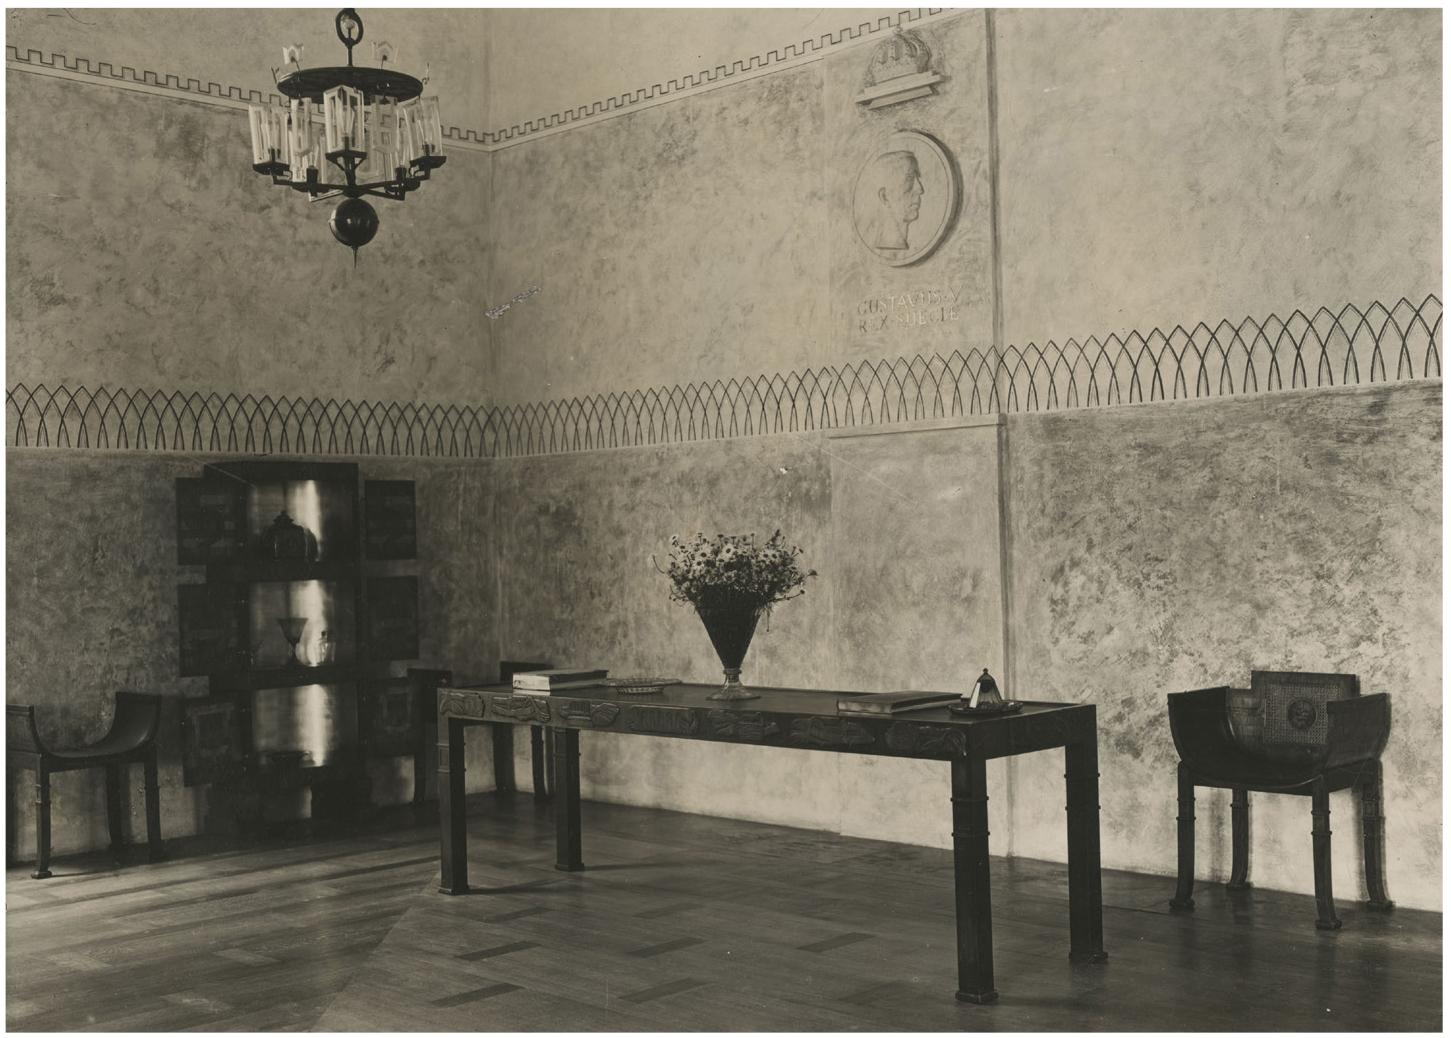 The Swedish pavilion at the Paris International Exhibition of 1925